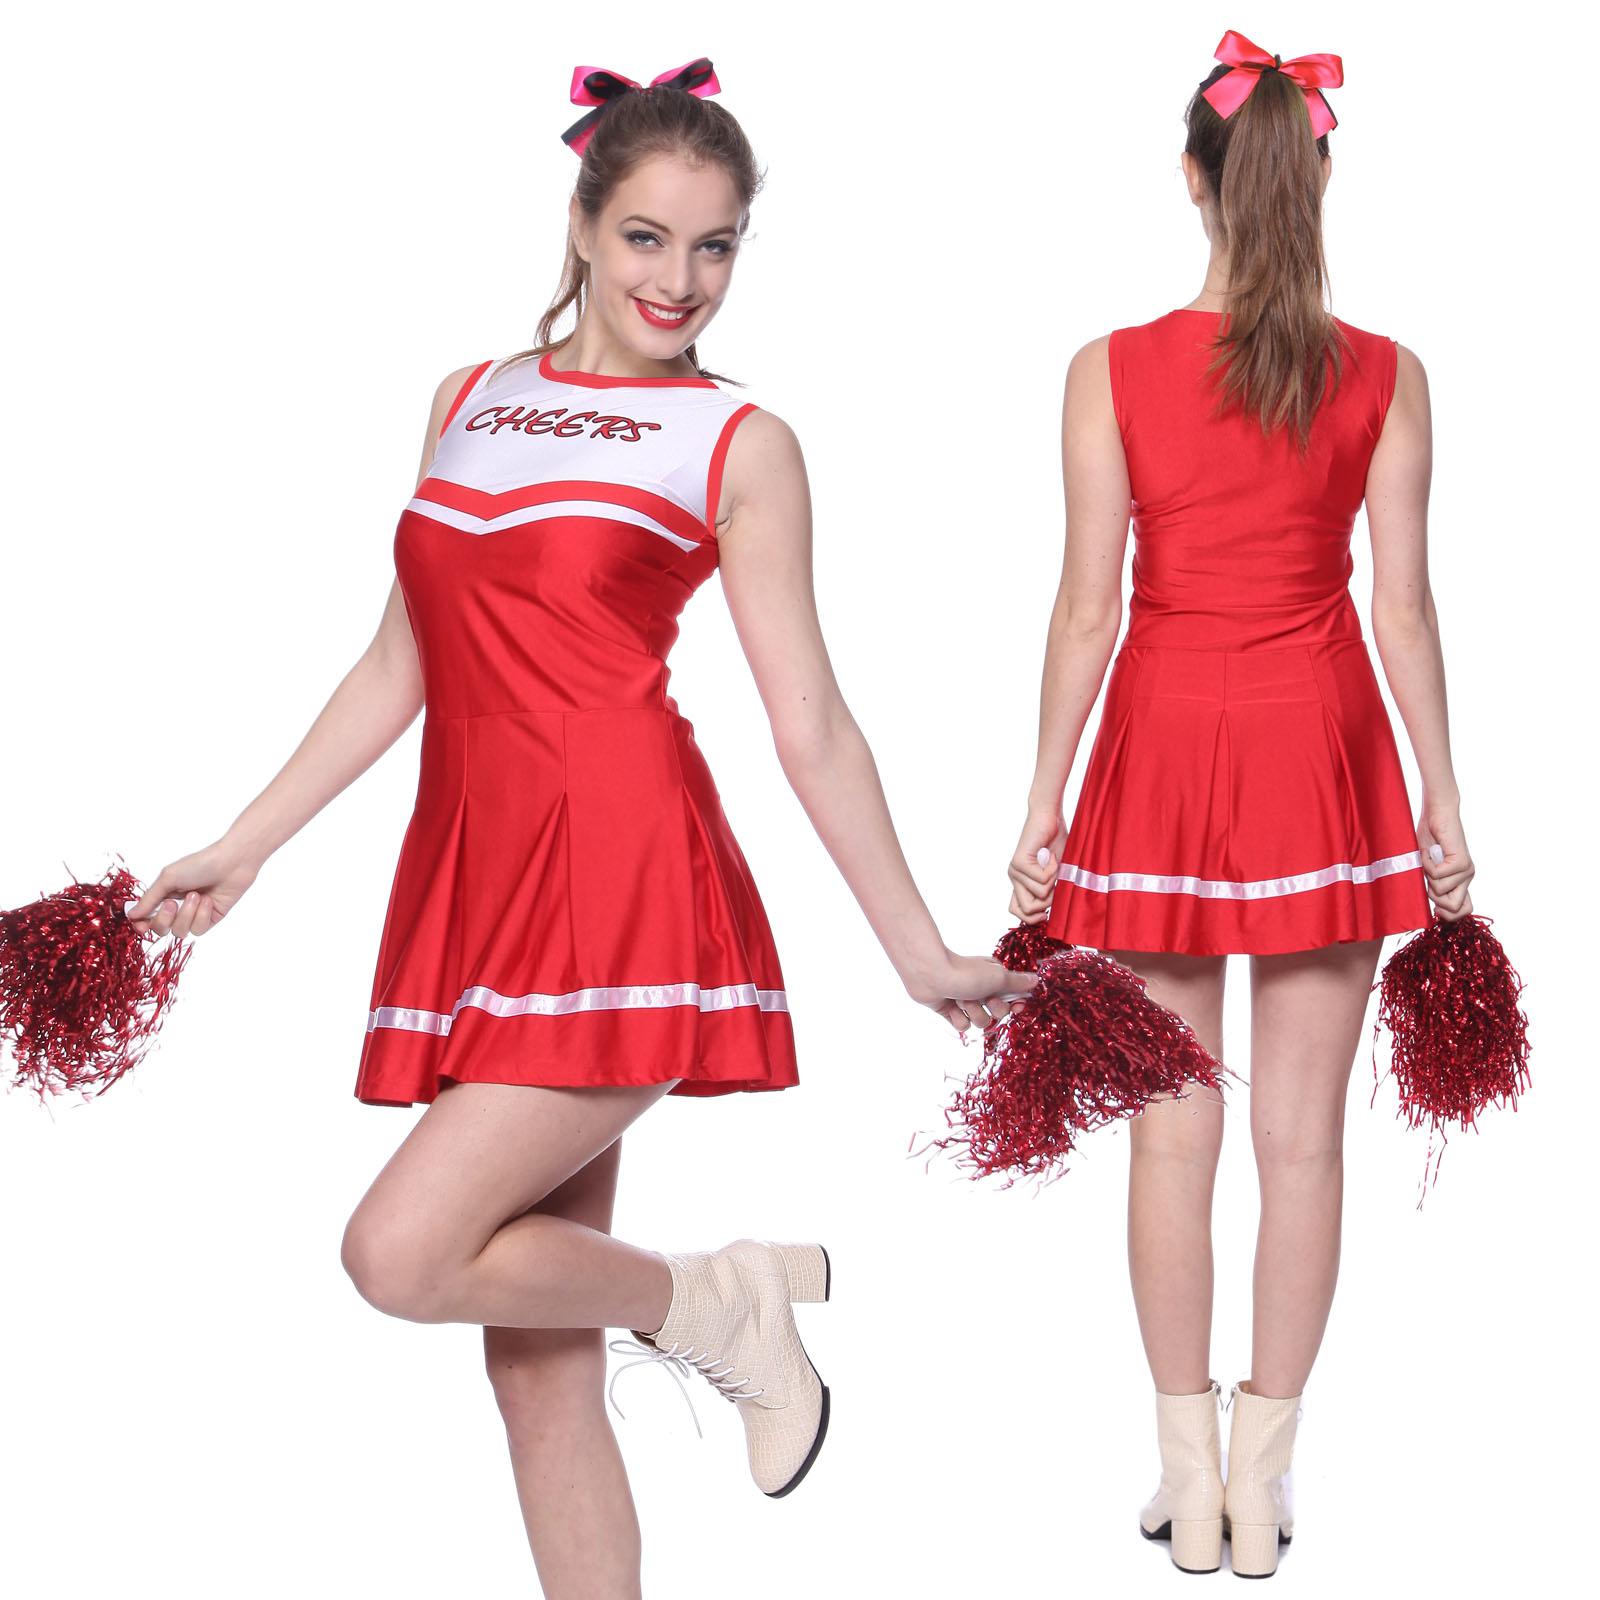 Womens High School Glee Sports Cheerleading Costume Cheerleader Fancy Dress